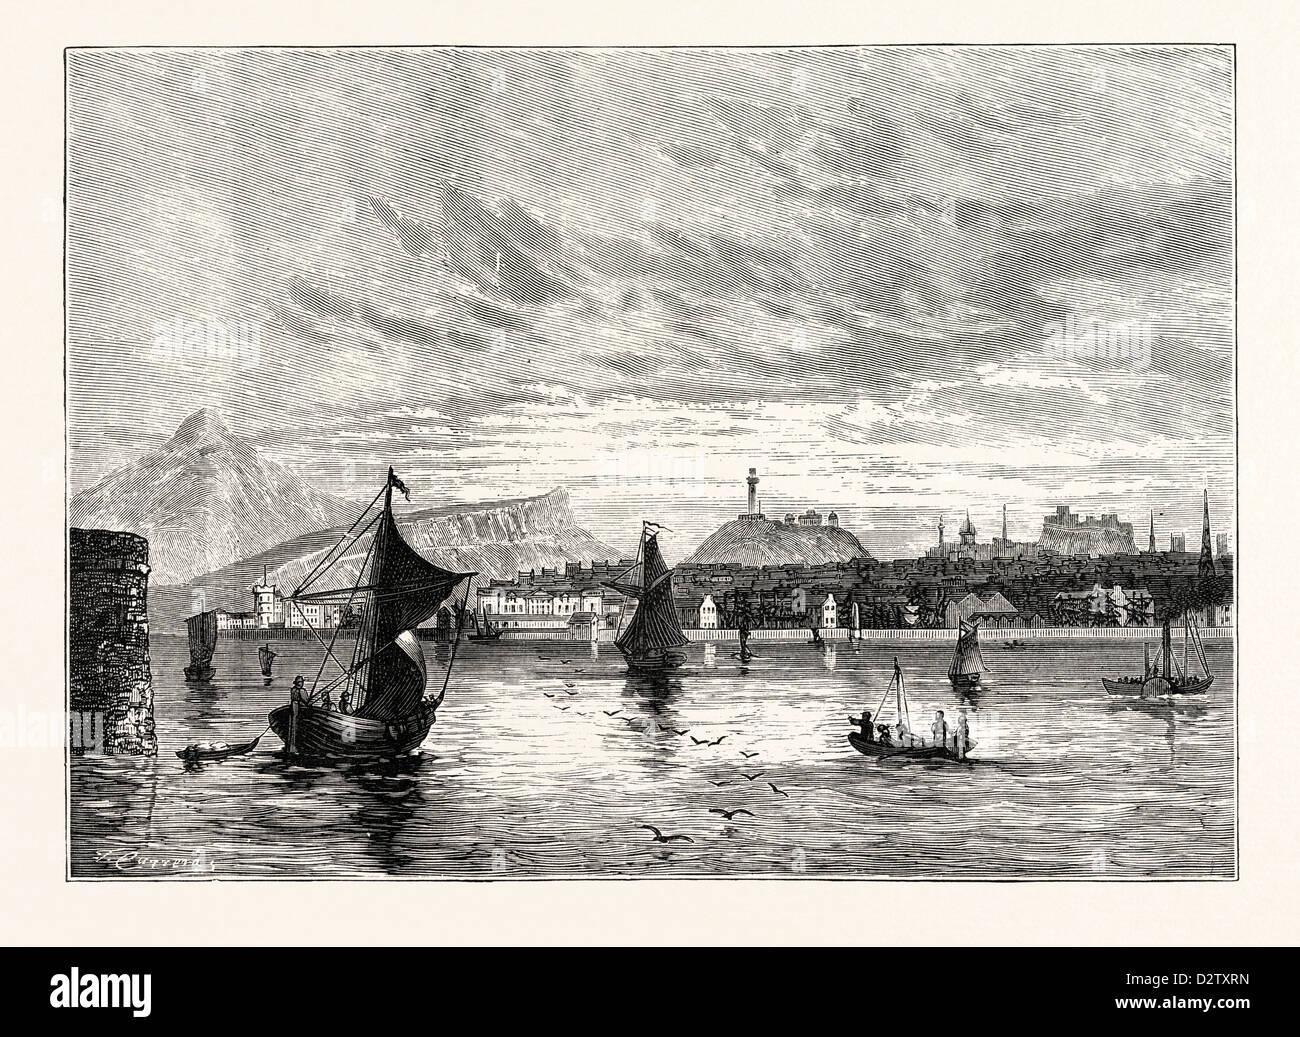 EDINBURGH: LEITH ROADS 1824 - Stock Image